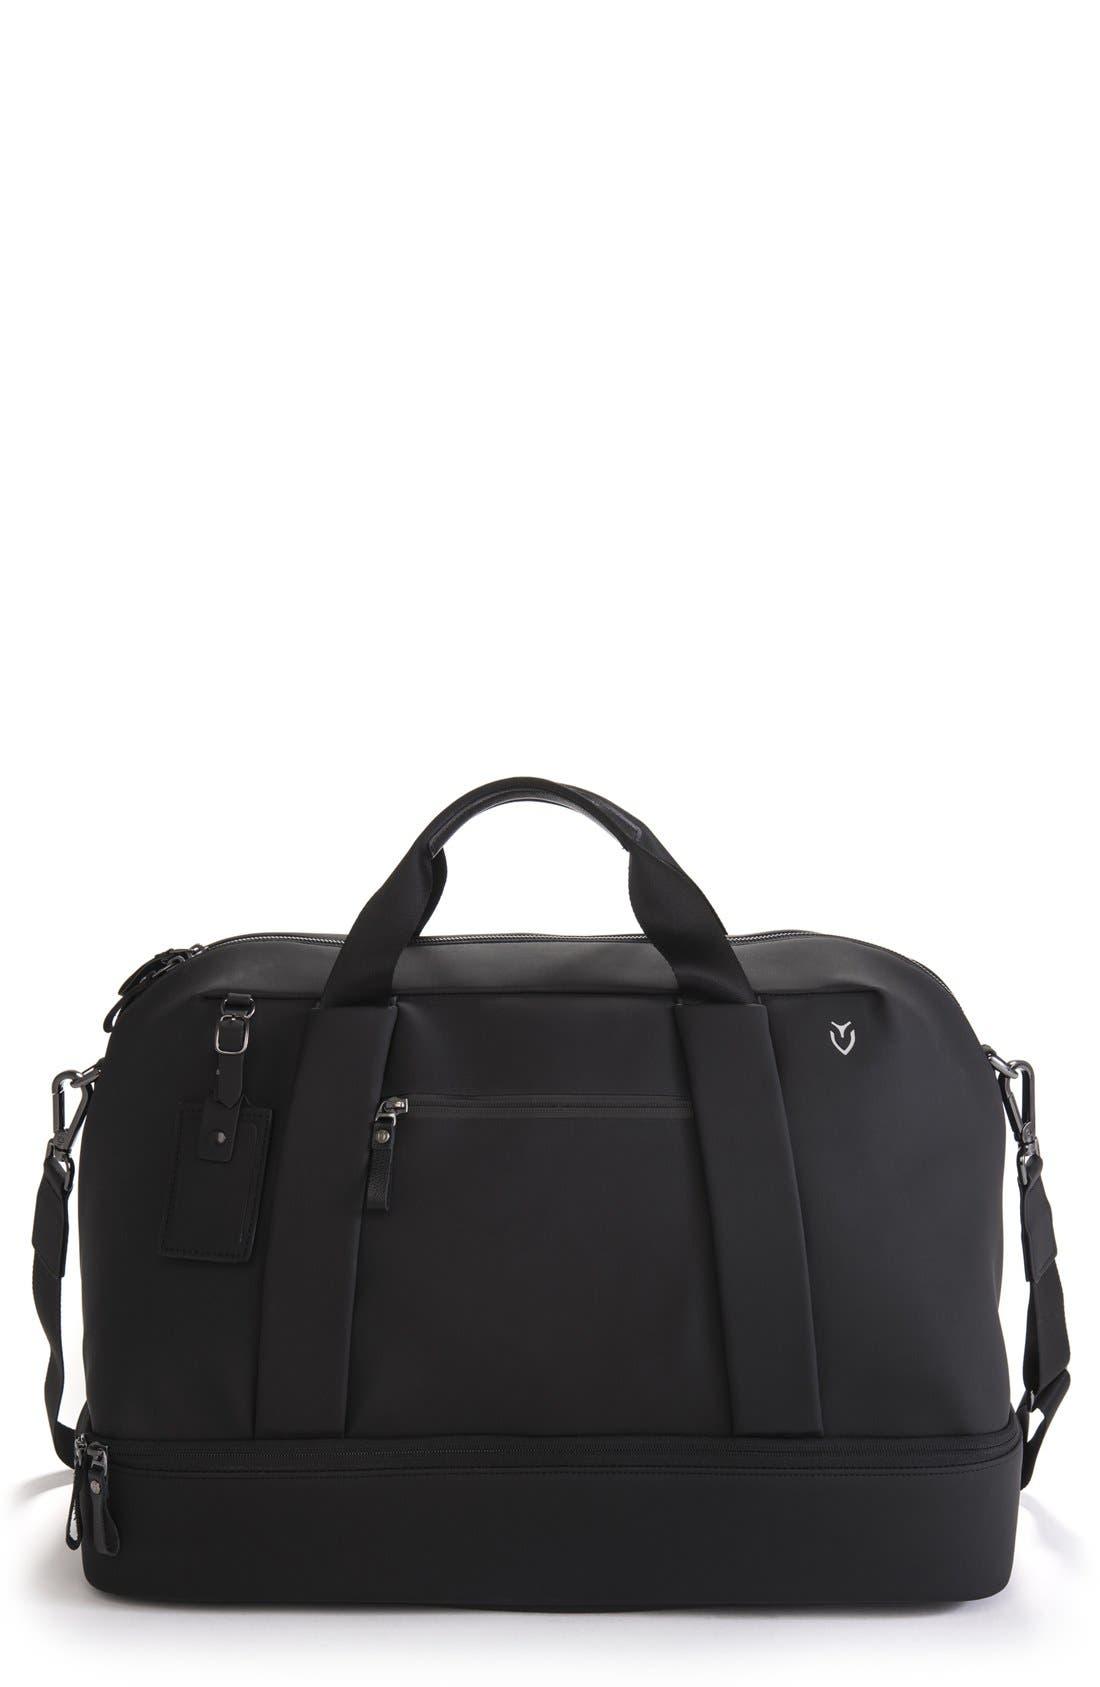 Signature Large Boston Duffel Bag,                             Main thumbnail 1, color,                             MATTE BLACK